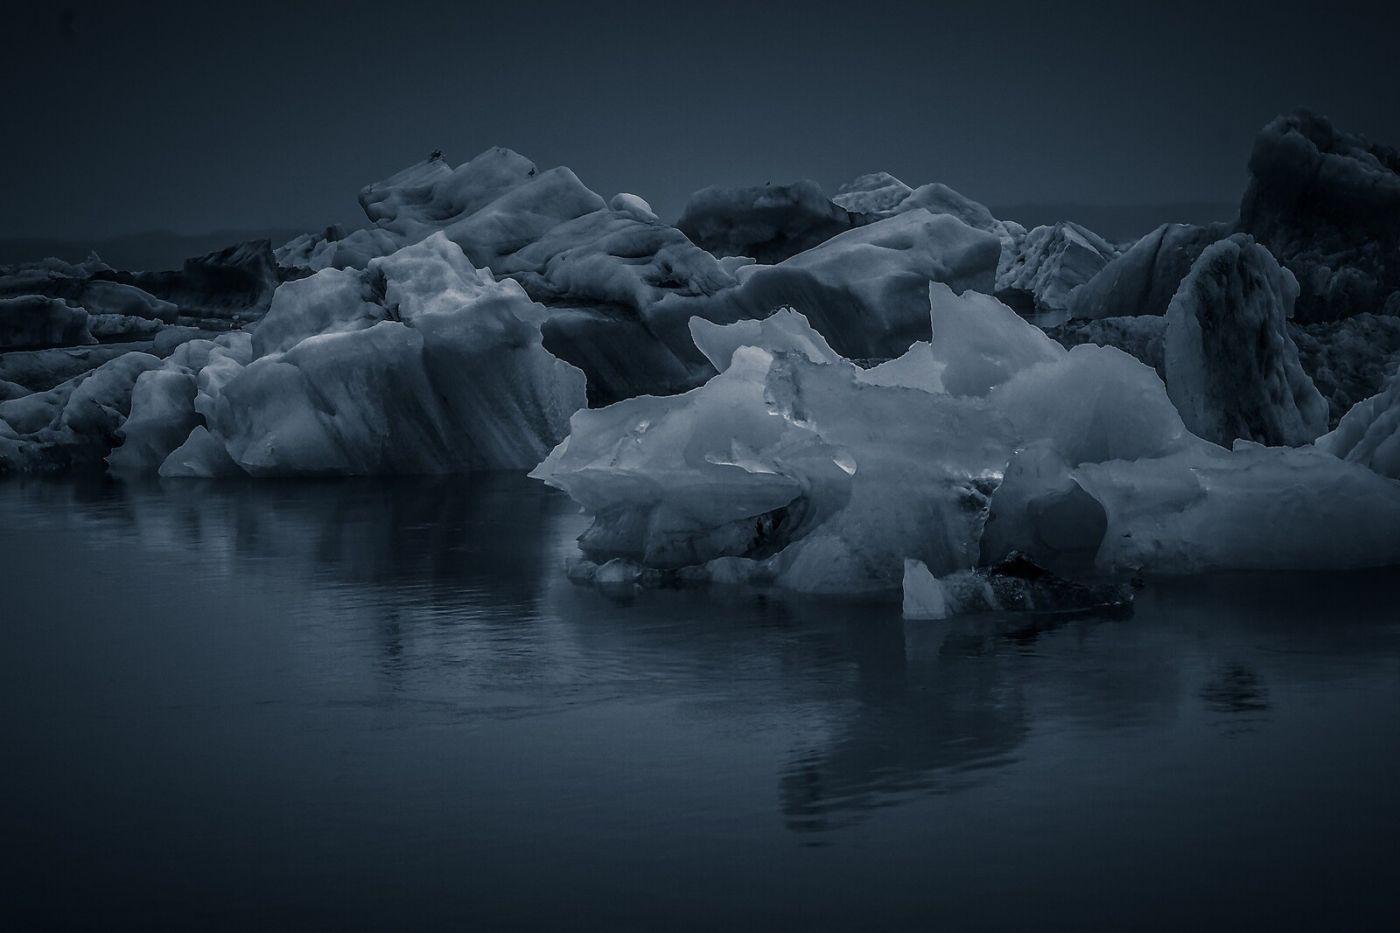 冰岛冰川泻湖(Glacier Lagoon),流动的冰川_图1-9